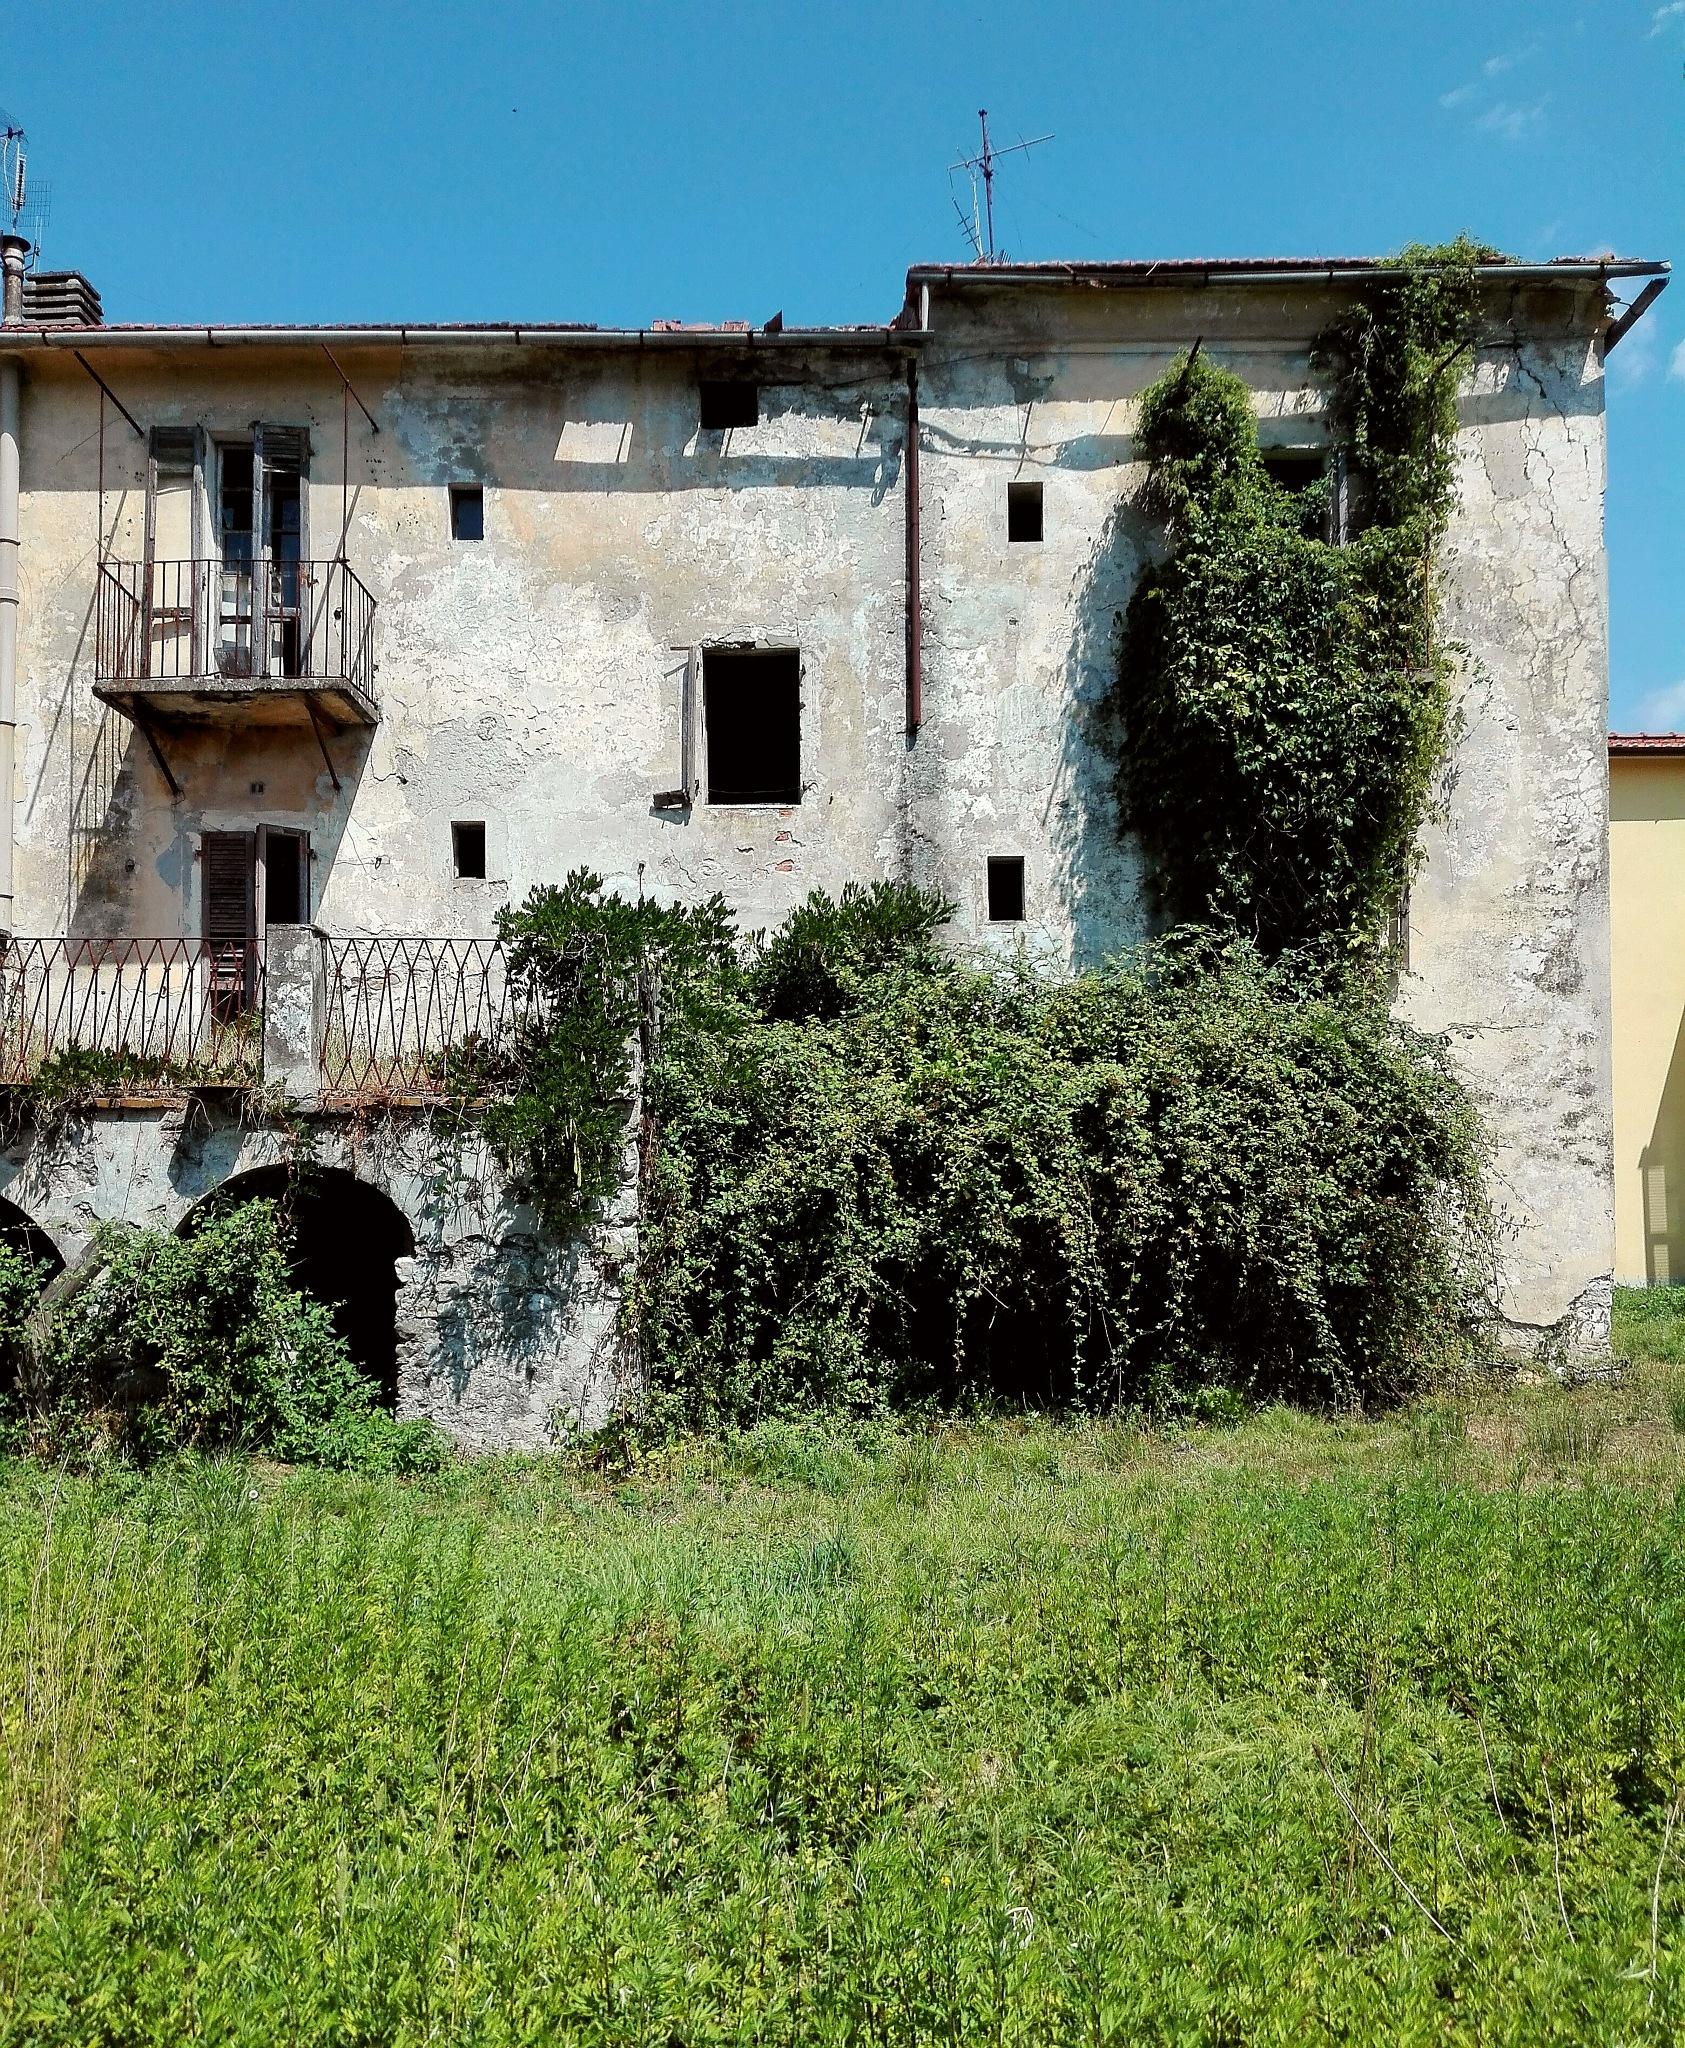 old house abandonate by  Gaelle Le Meur